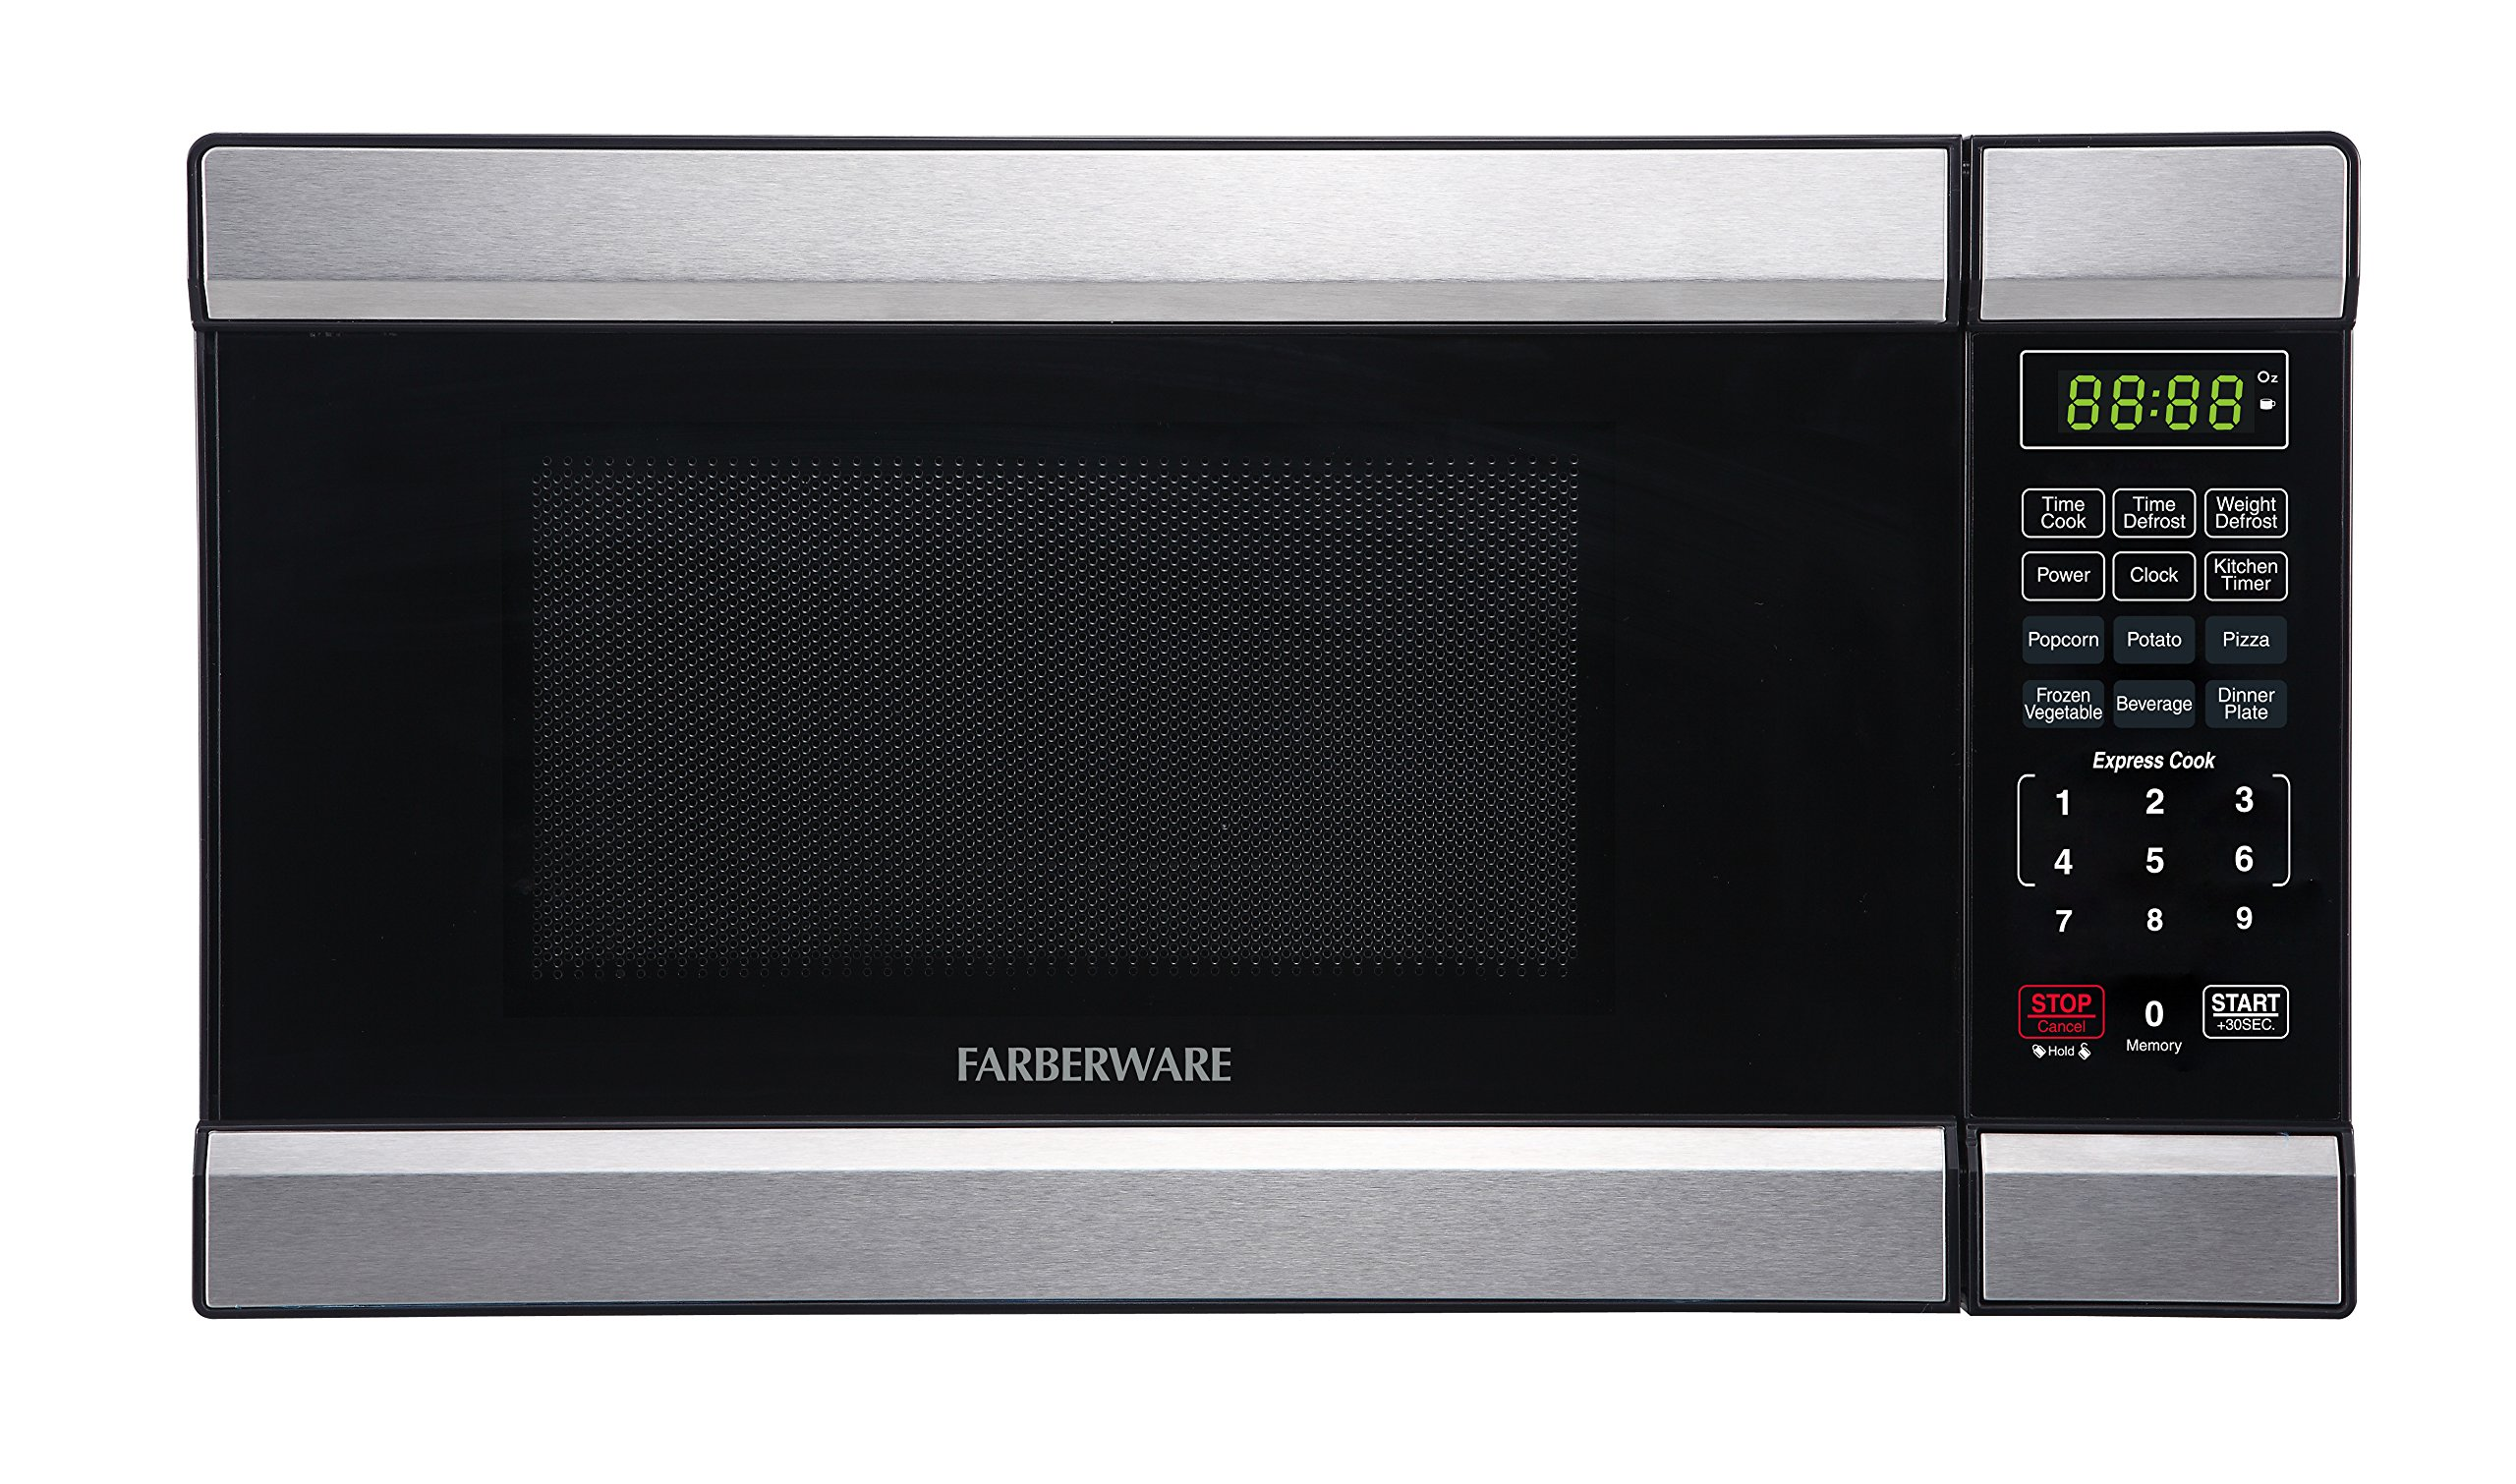 Farberware FMO07ABTBKQ 0.7 Cubic Foot 700 Watt Microwave Oven, Stainless Steel/Black